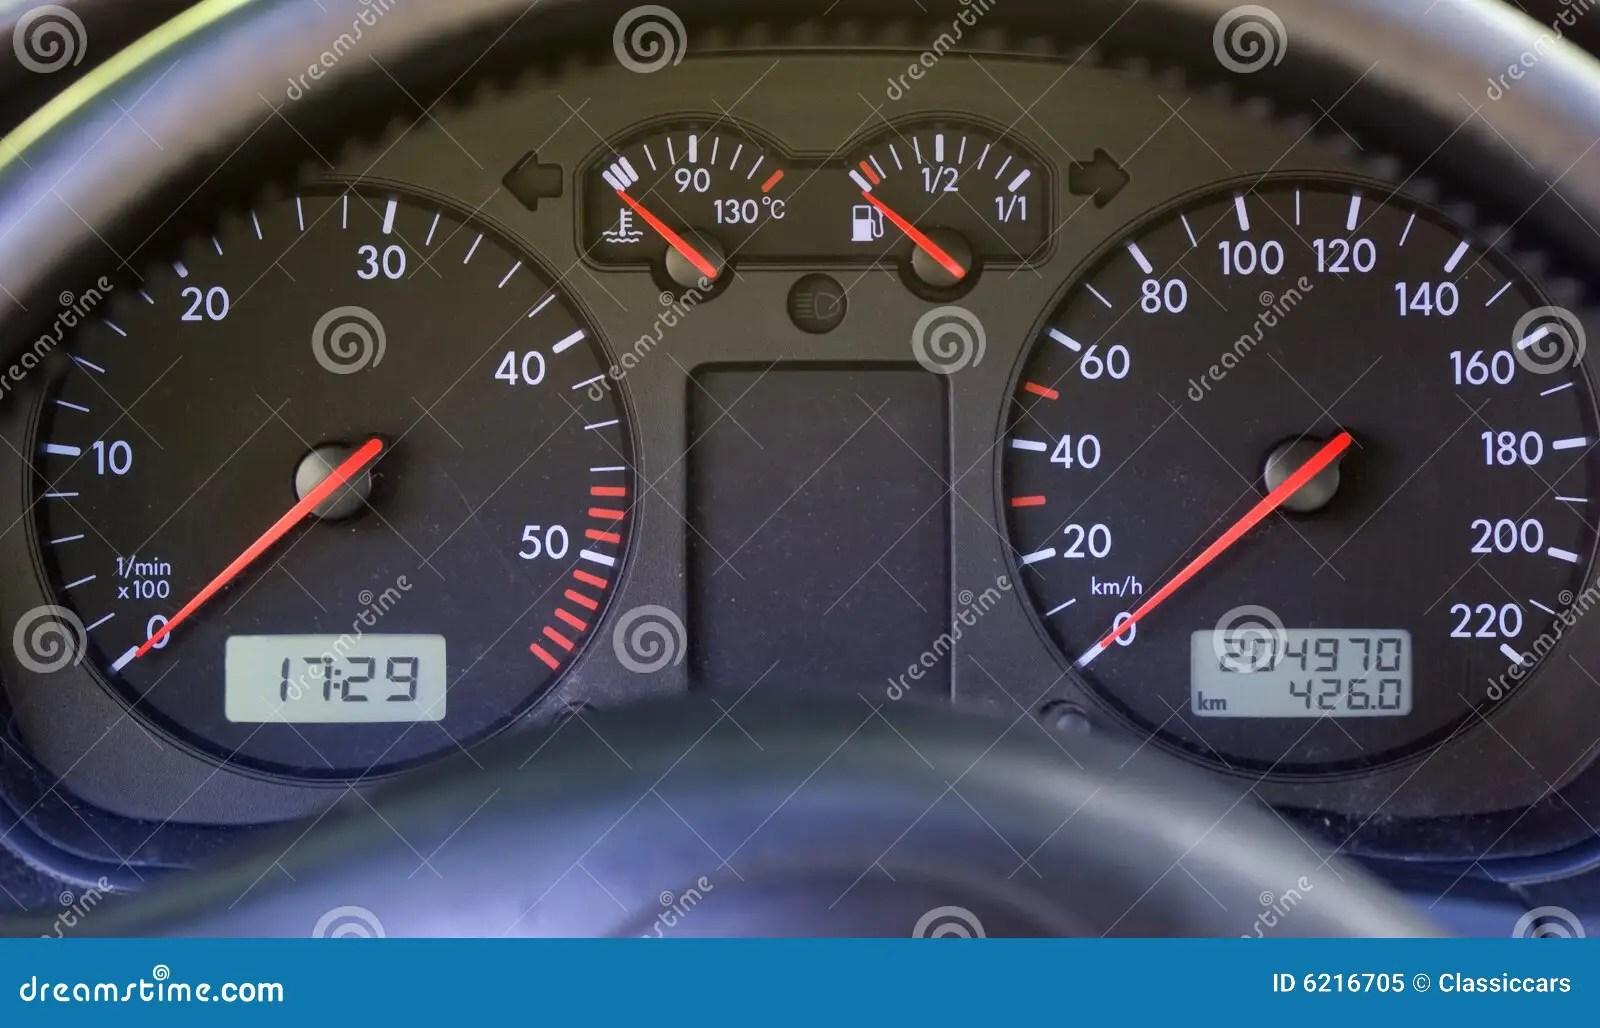 Instrument Panel On Modern Car Dashboard Stock Image